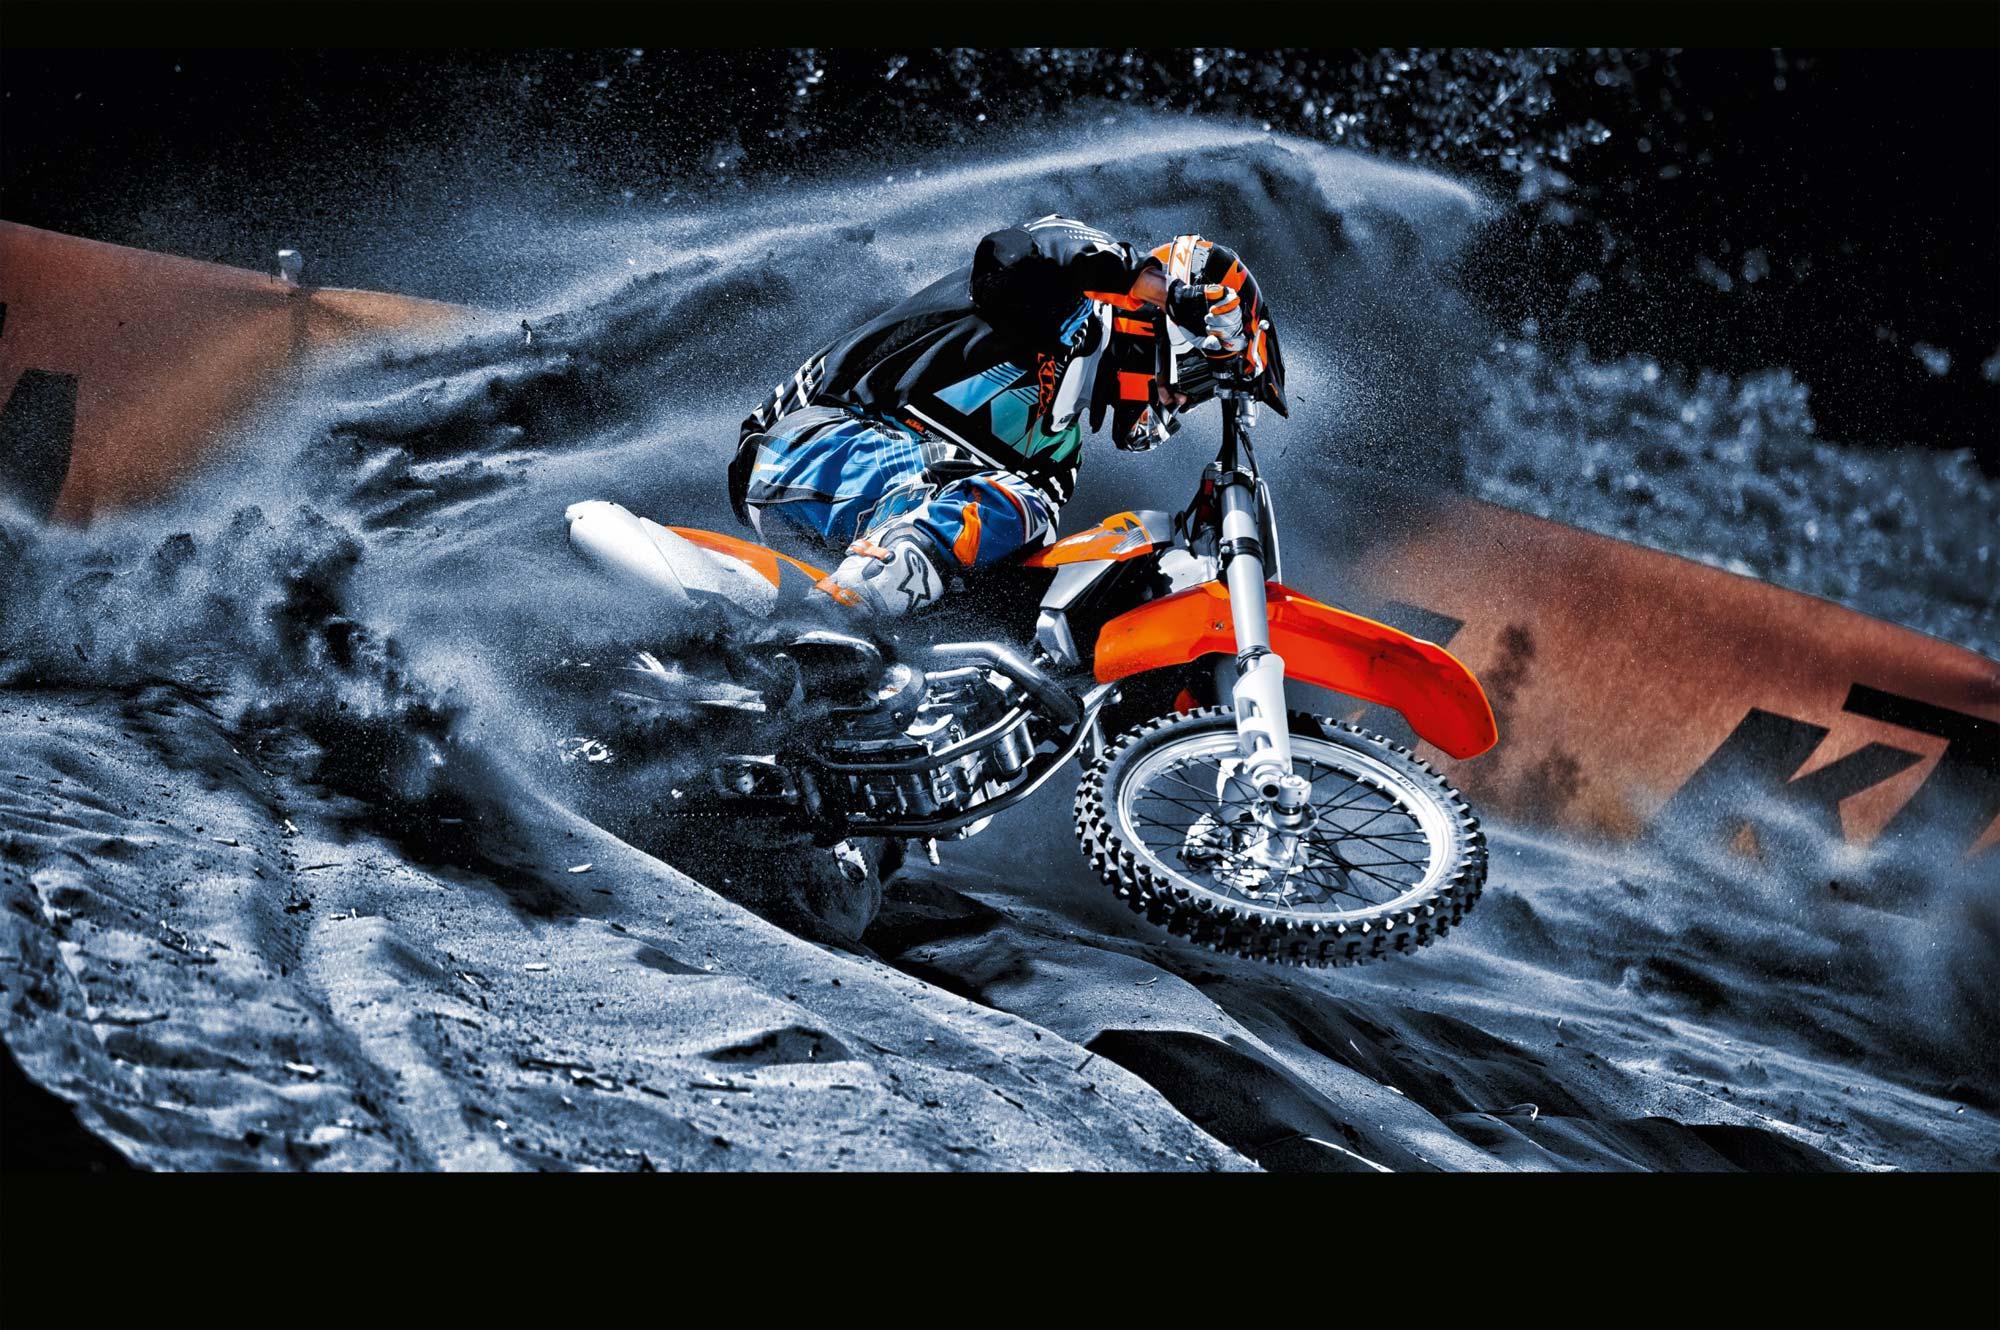 Ktm Bikes Wallpapers Wallpapertag: 2013 KTM 450SX-F Wallpaper